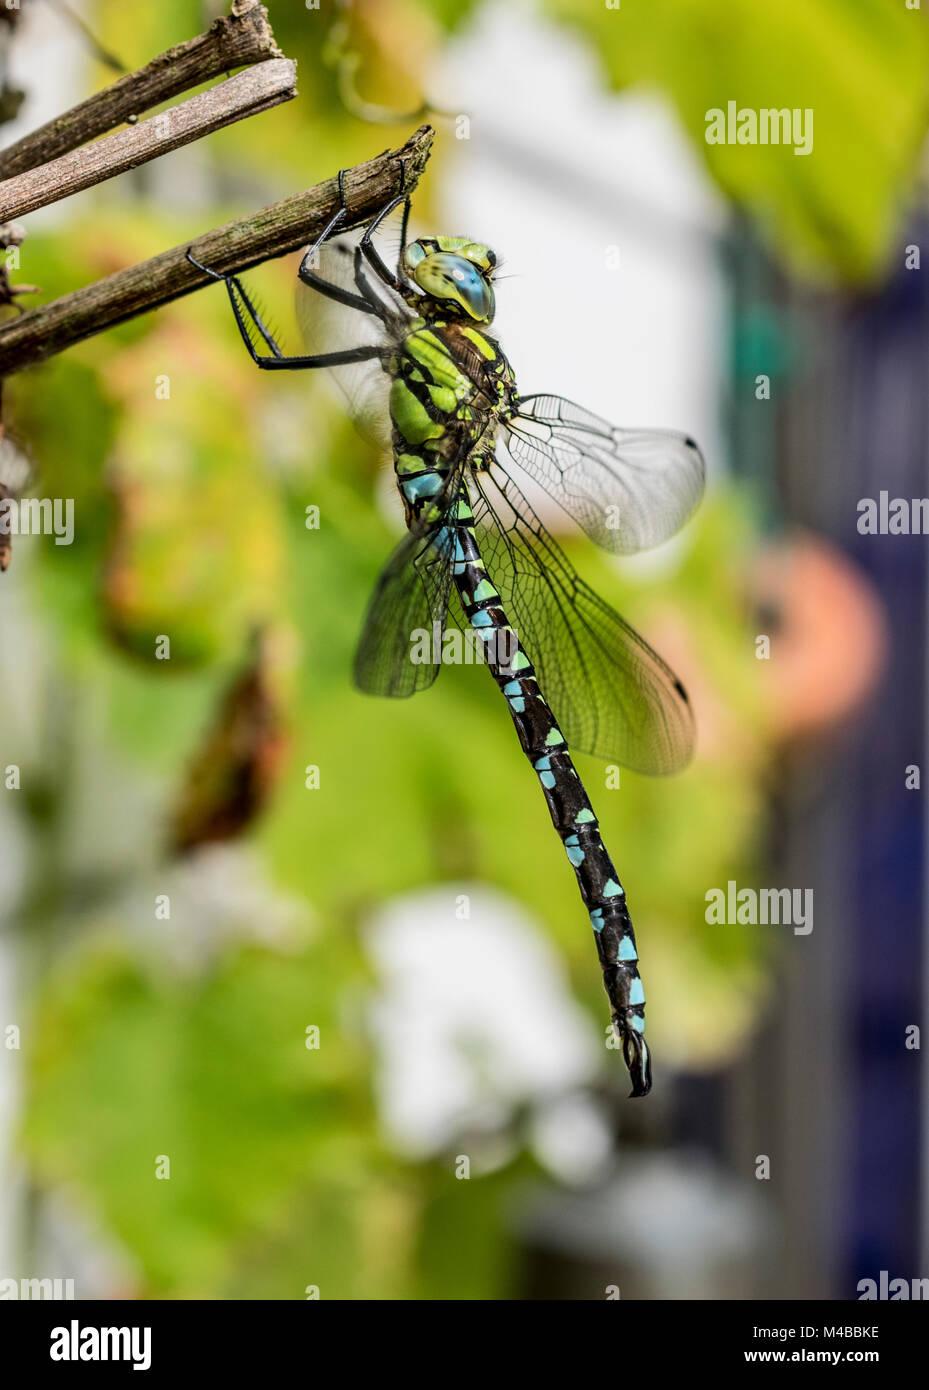 Libelle an einem Busch sitzend als Makrofoto - Stock Image